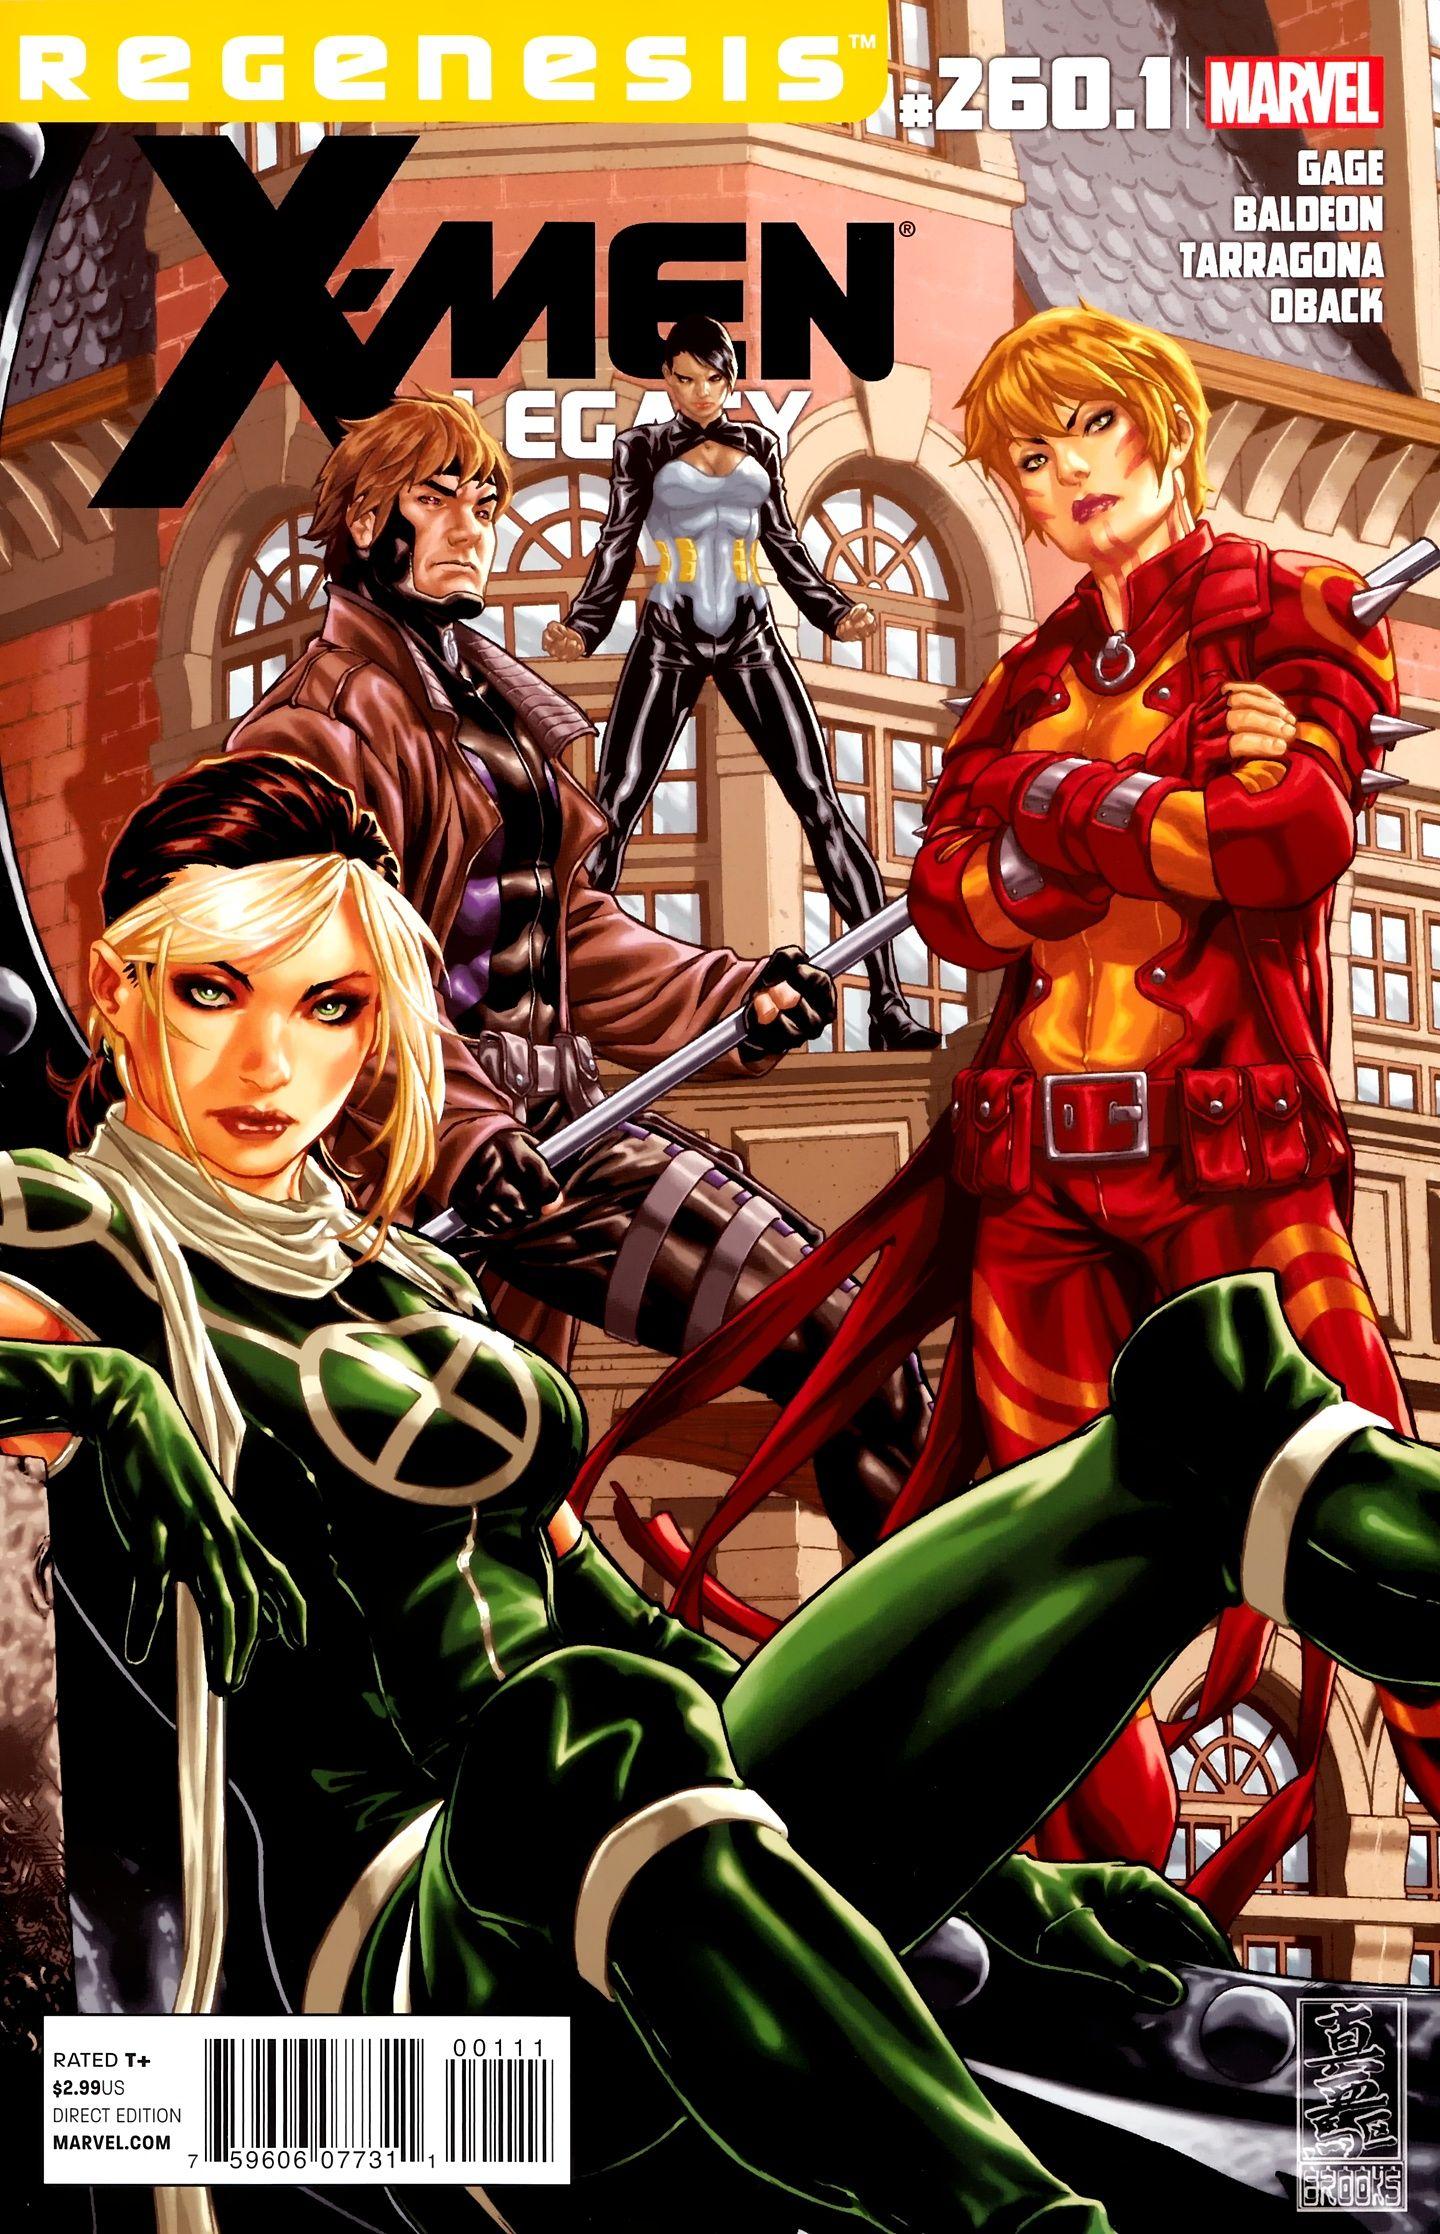 X Men Legacy Vol 1 260 1 Cover Art By Mark Brooks Marvel Girls Comics Comic Illustration